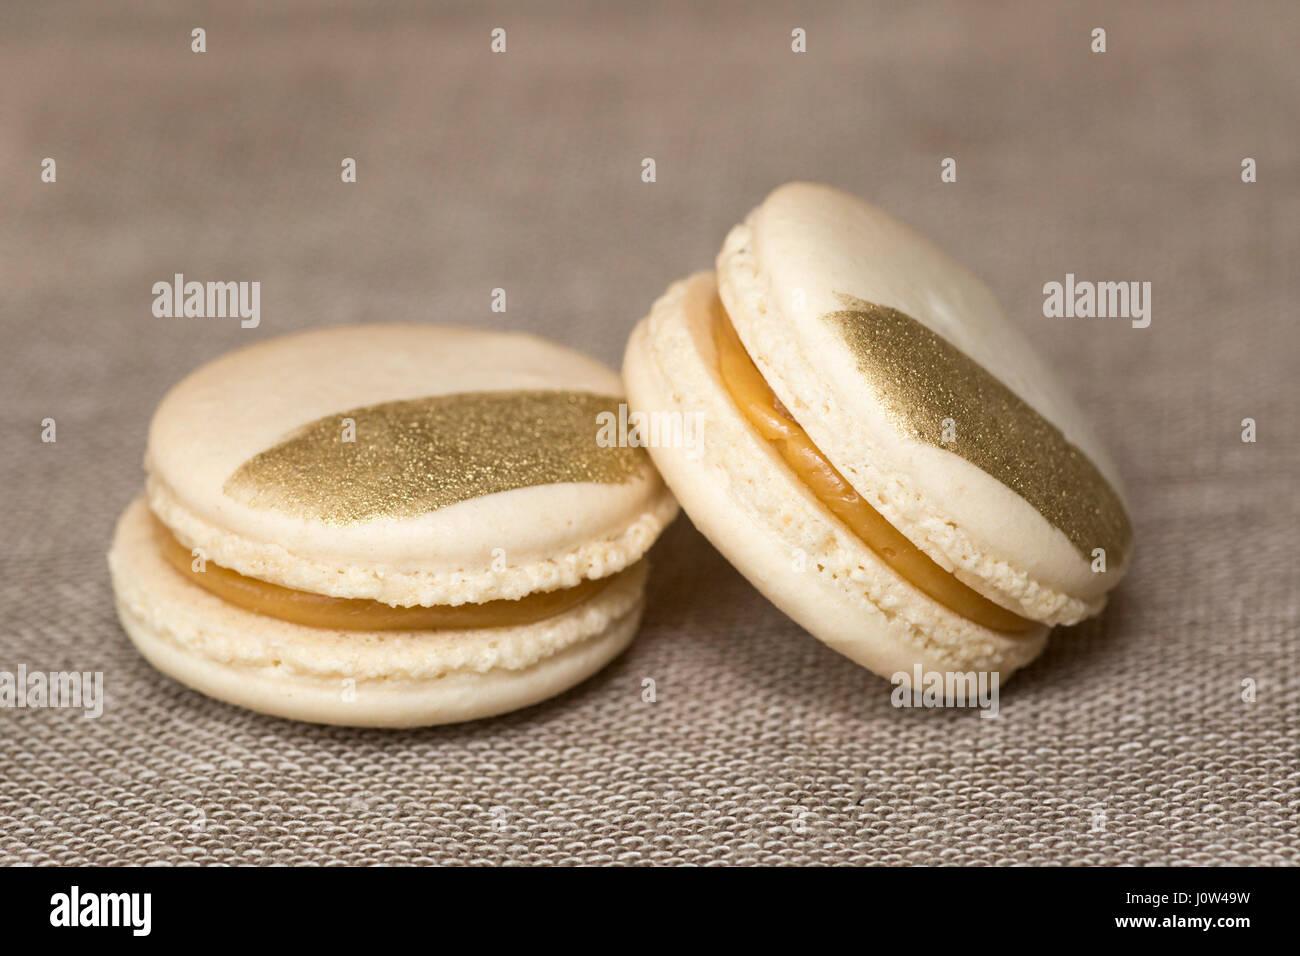 Salted caramel macarons on Irish linen - Stock Image